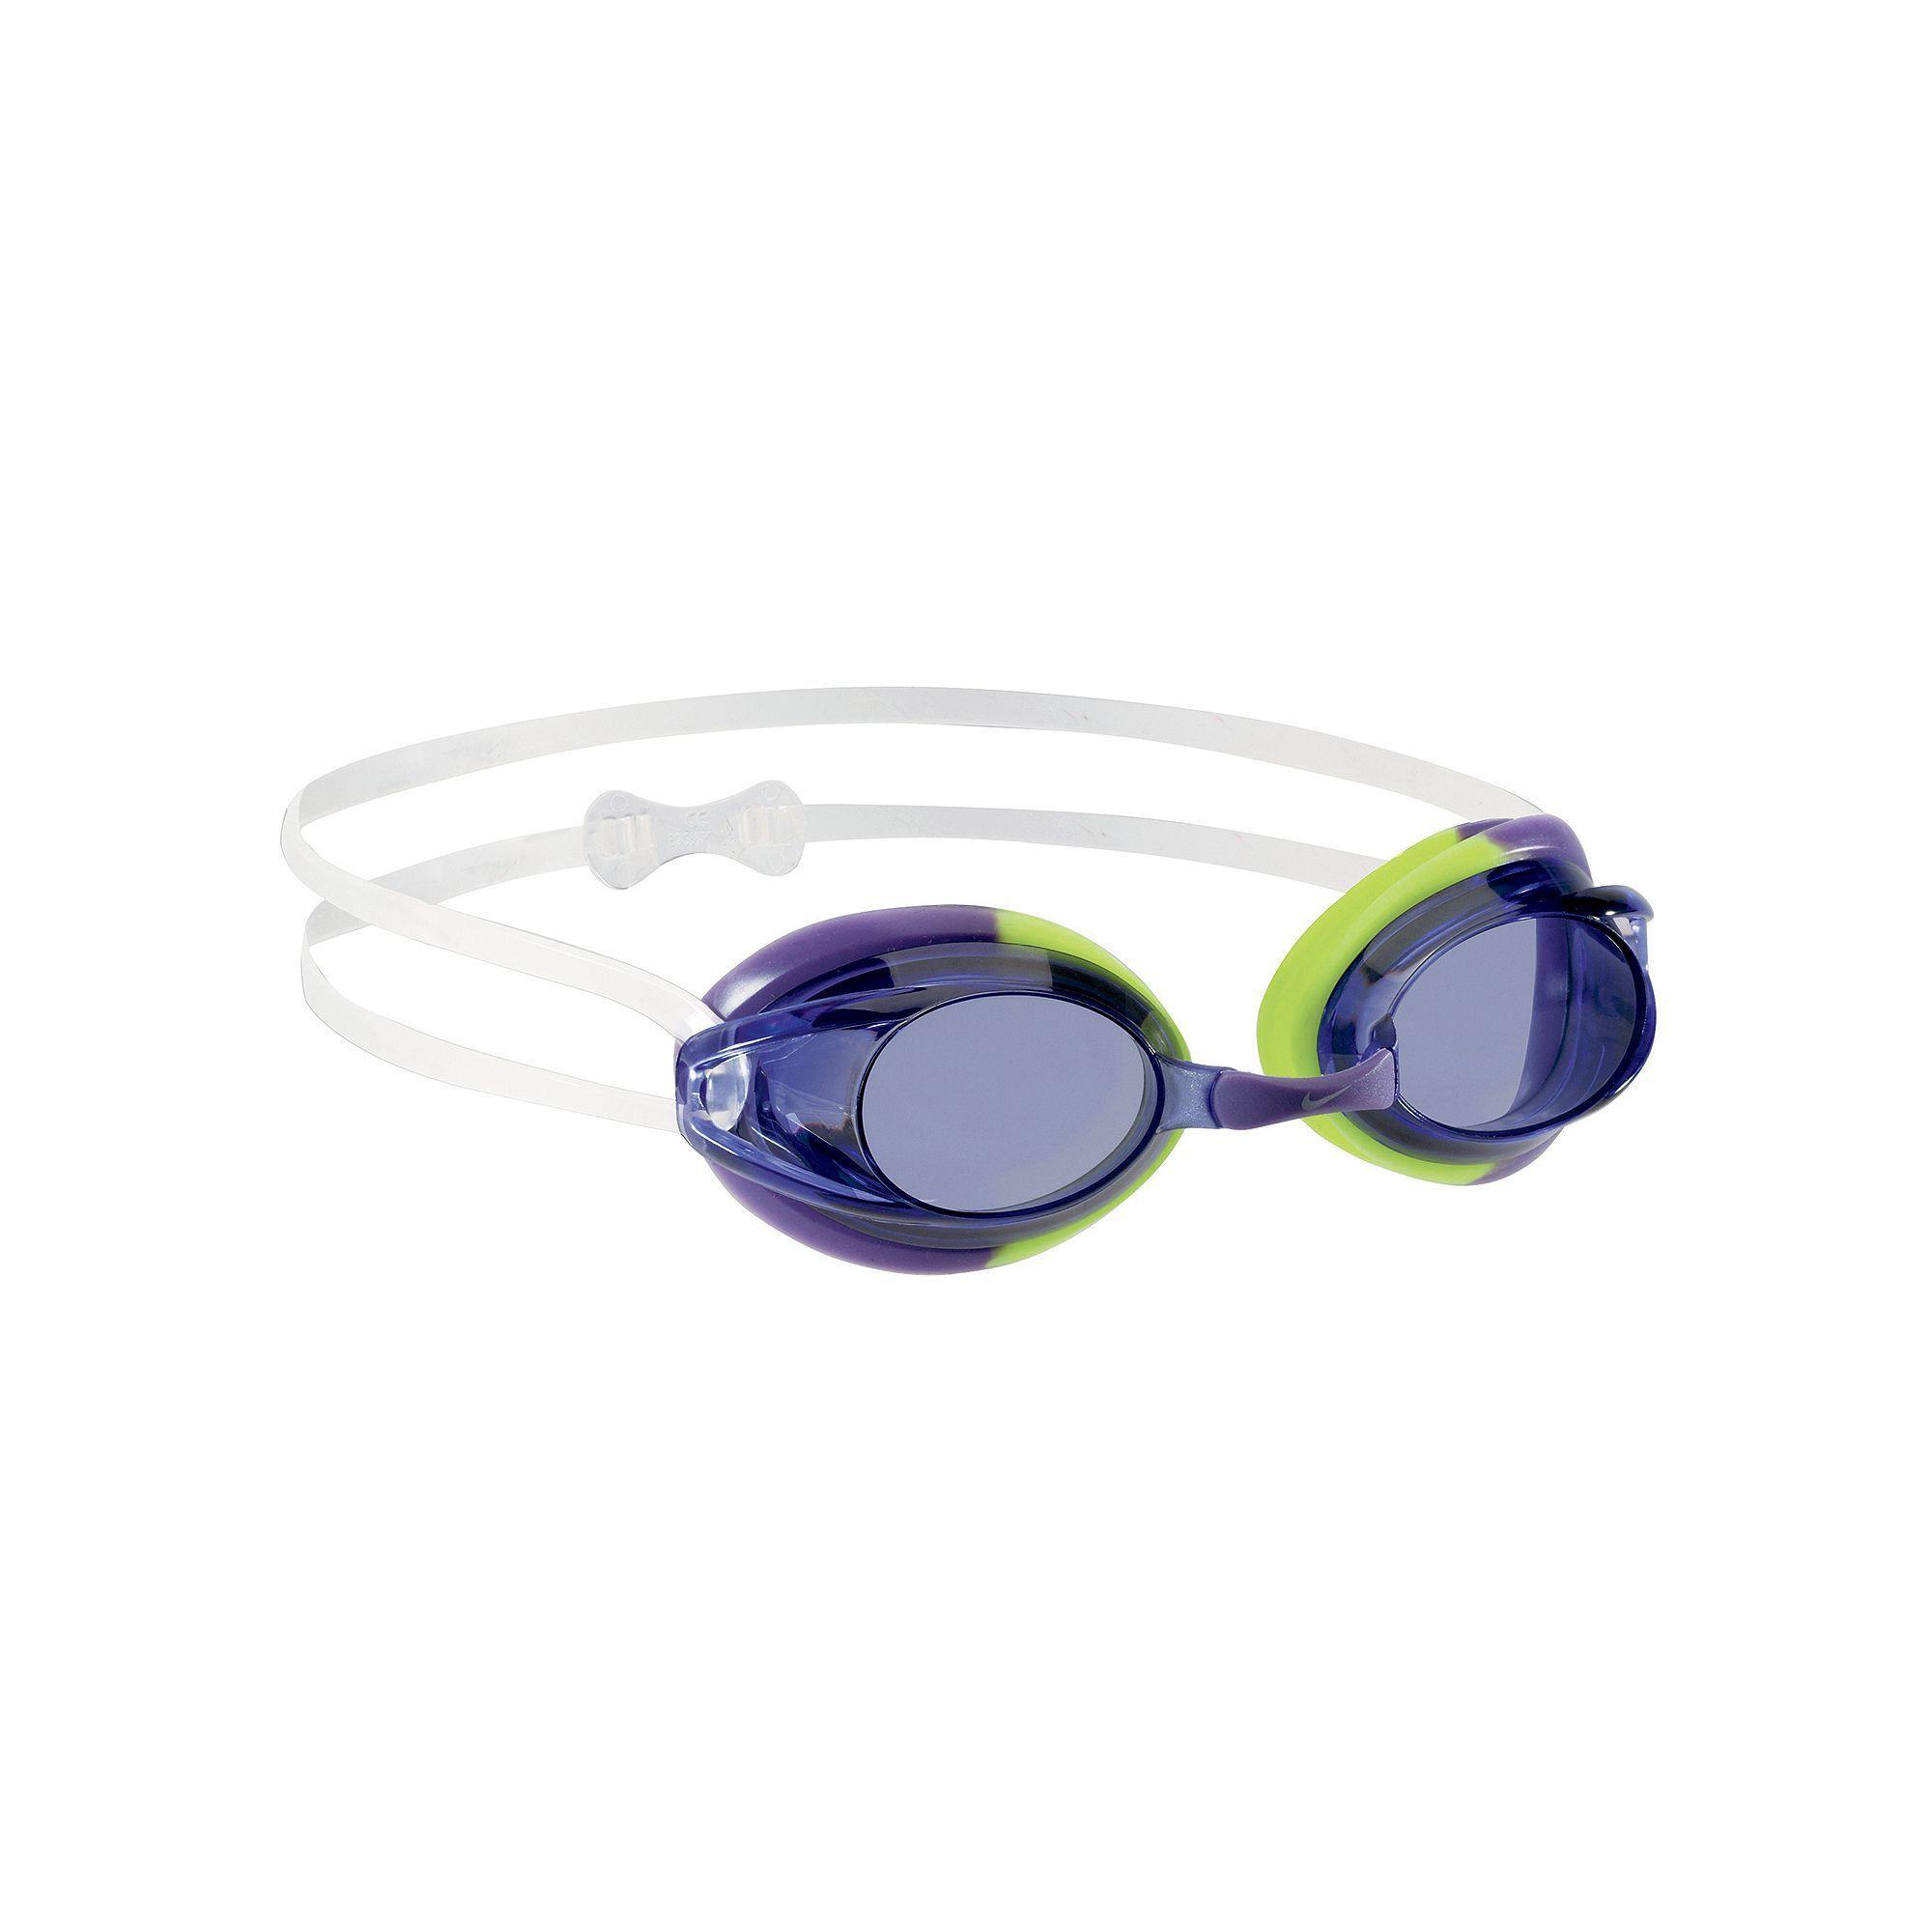 Nike Remora Jr. Swim Goggles Swimming equipment